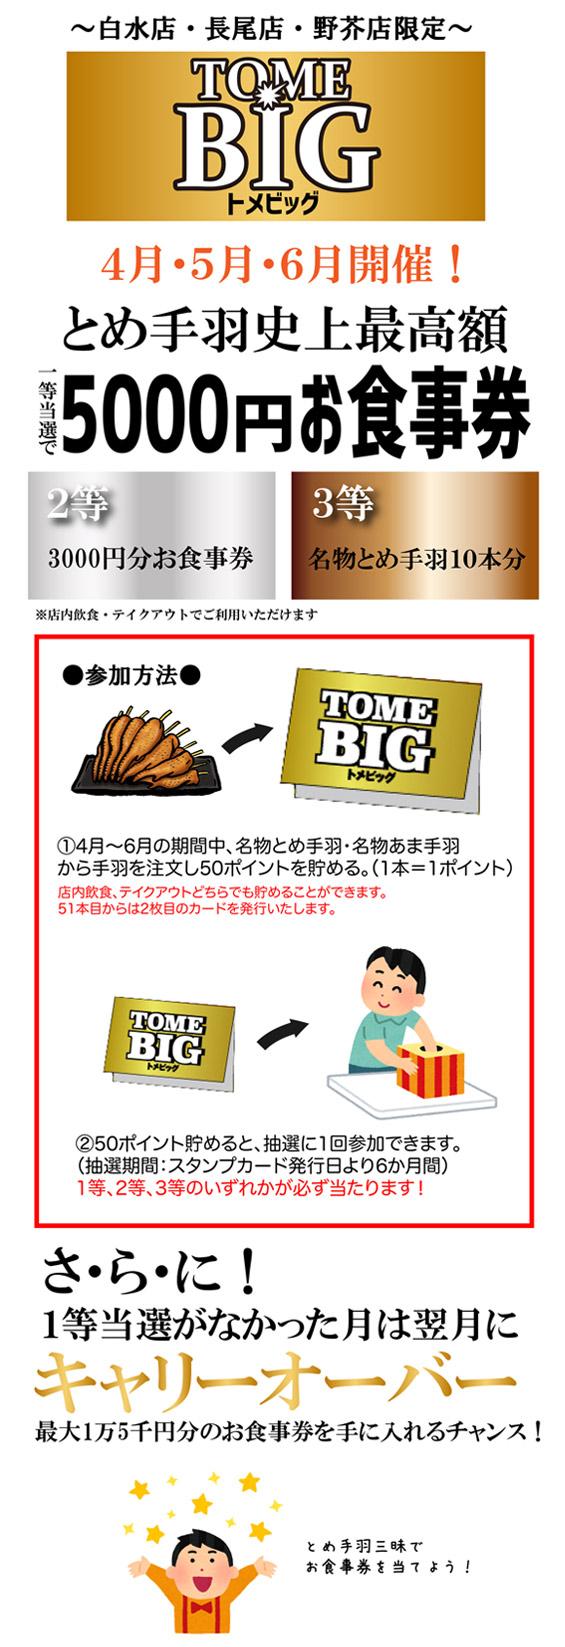 白水店・長尾店・野芥店限定~とめBIG~ 画像